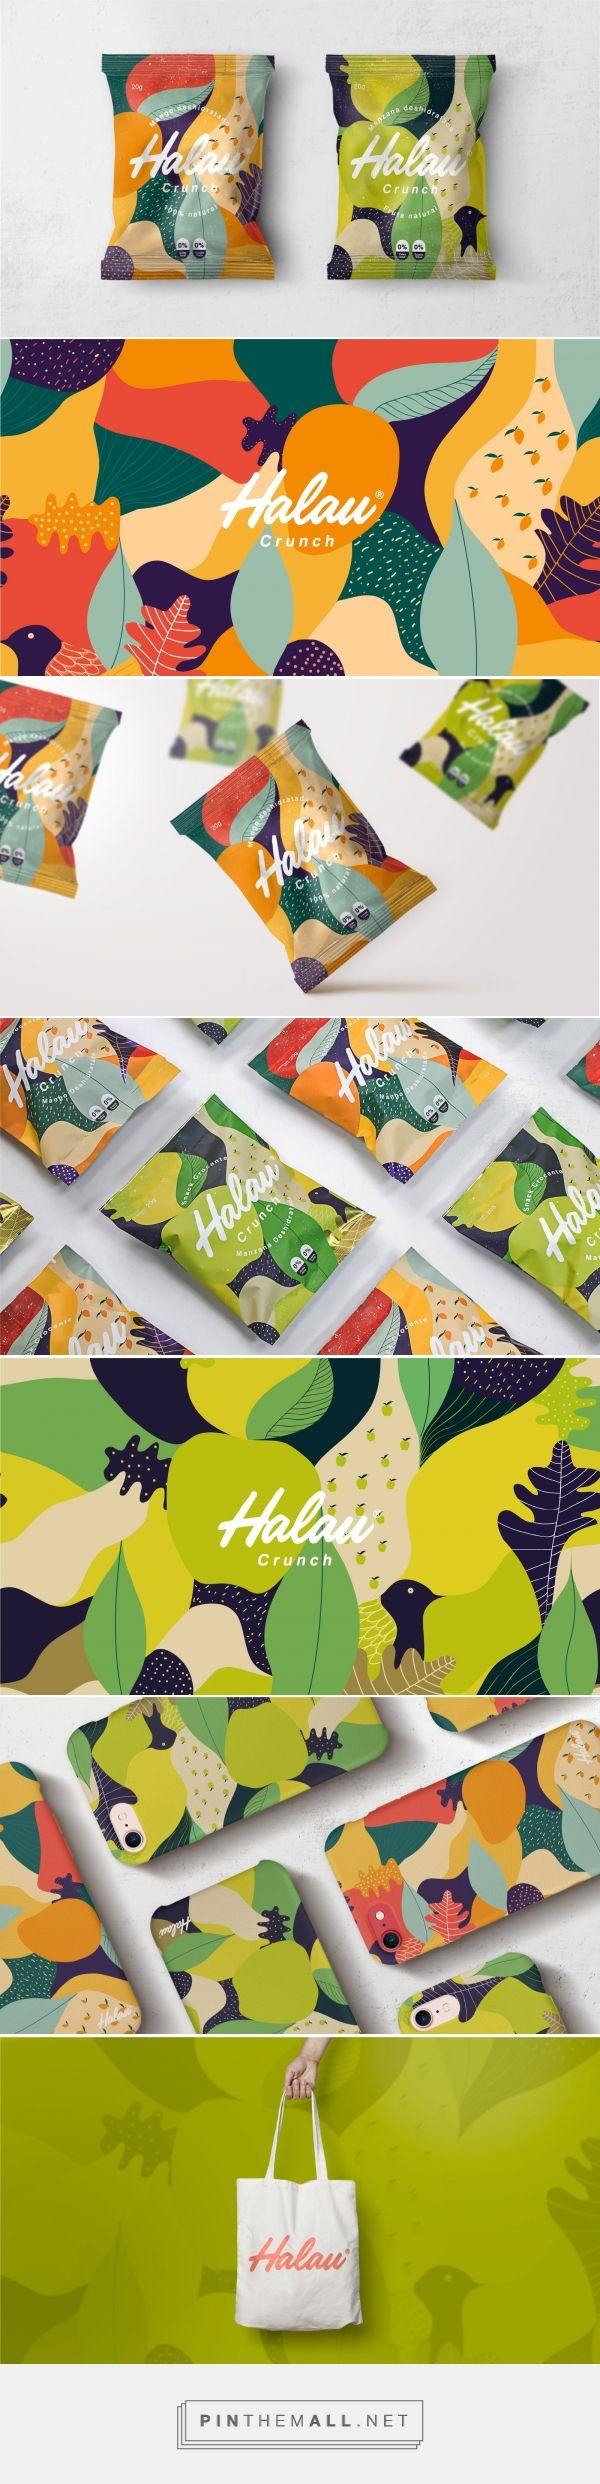 Aloha! Halau fruit snacks packaging design by Creamos - http://www.packagingoftheworld.com/2018/01/halau.html